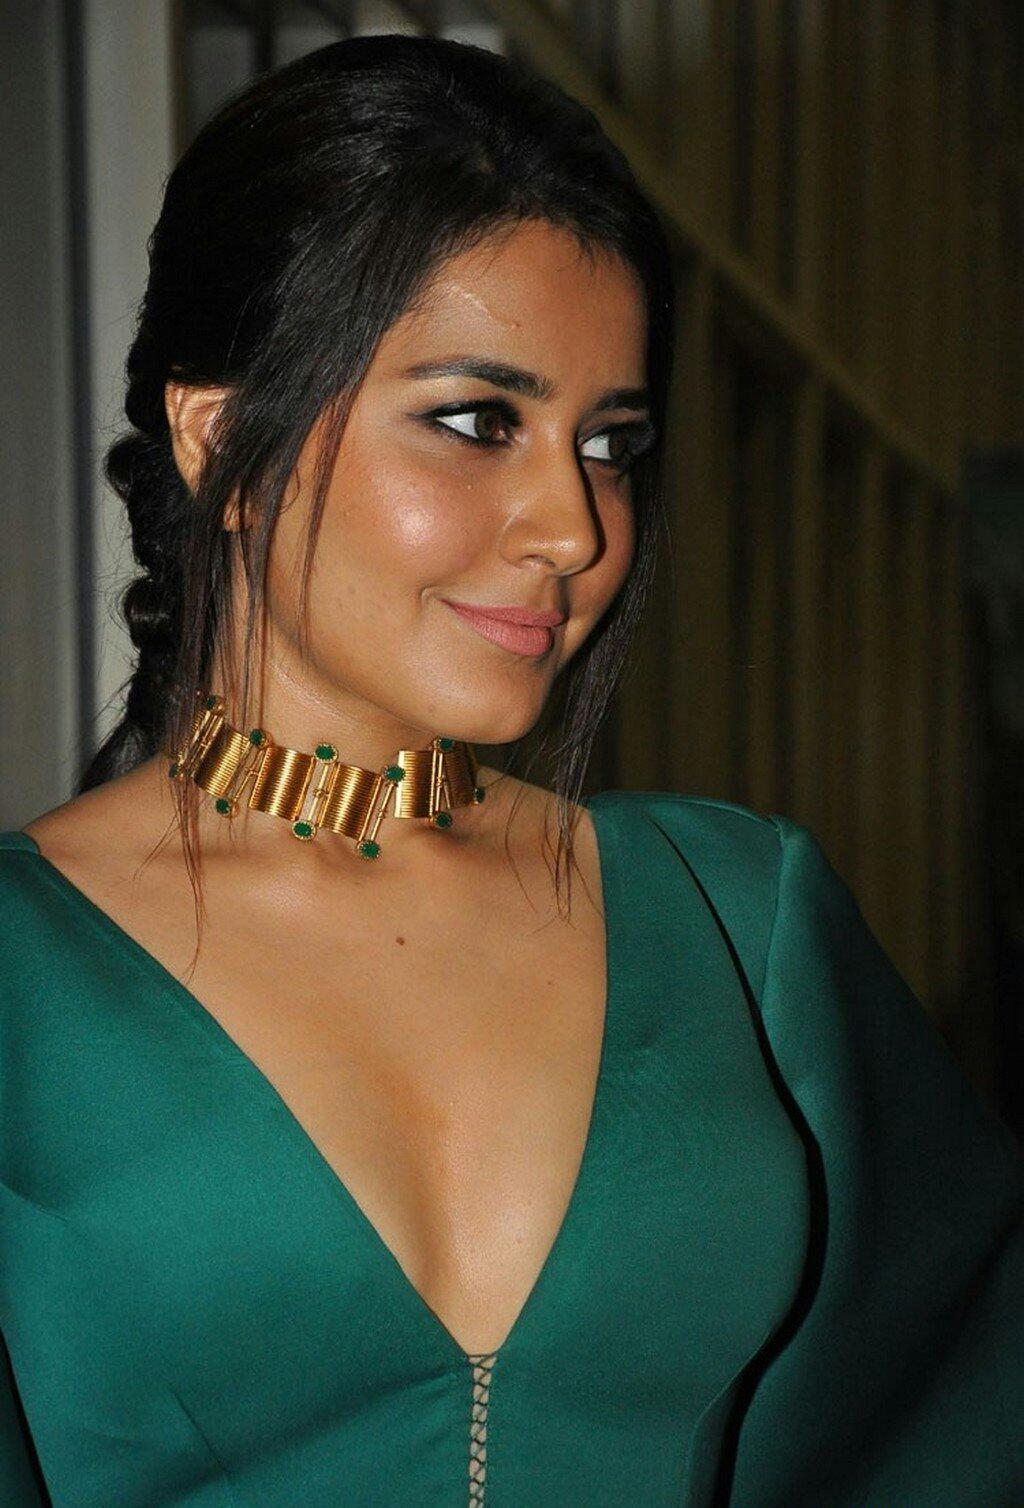 Rashi Khanna Sexy Deep Cleavage At Hyper Trailer Launch 8 1 - Rashi Khanna Sexiest Cleavage Pictures Collection-Hot HD Photos